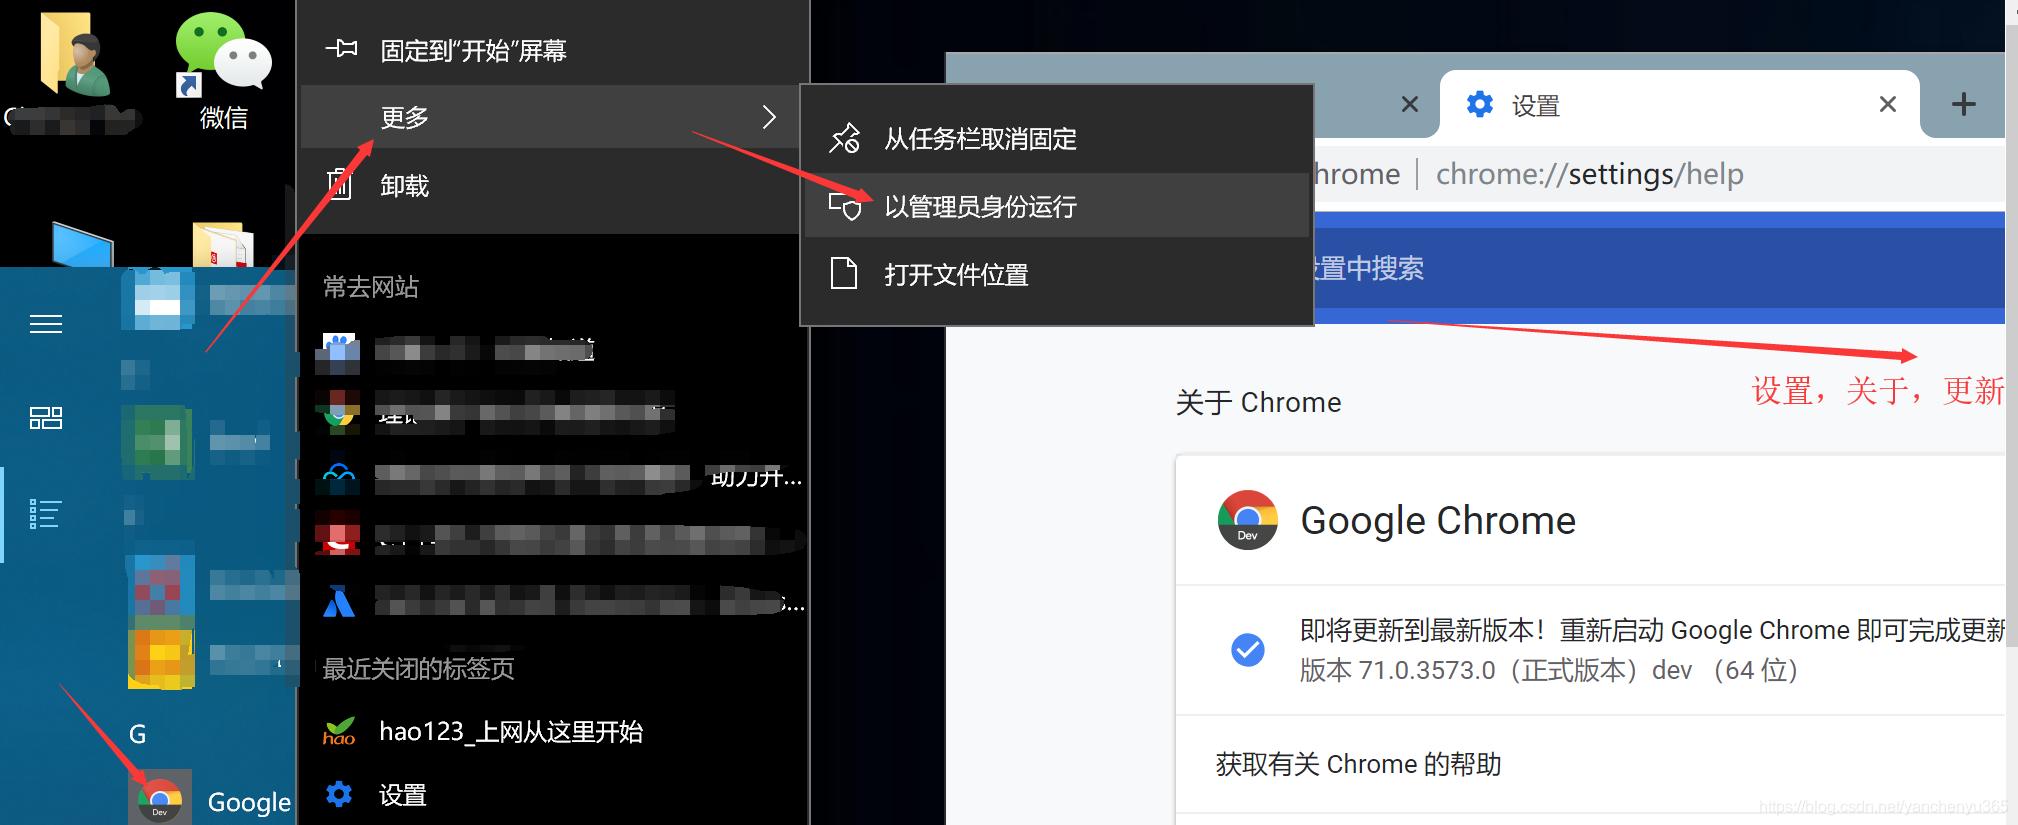 Chrome 更新 google